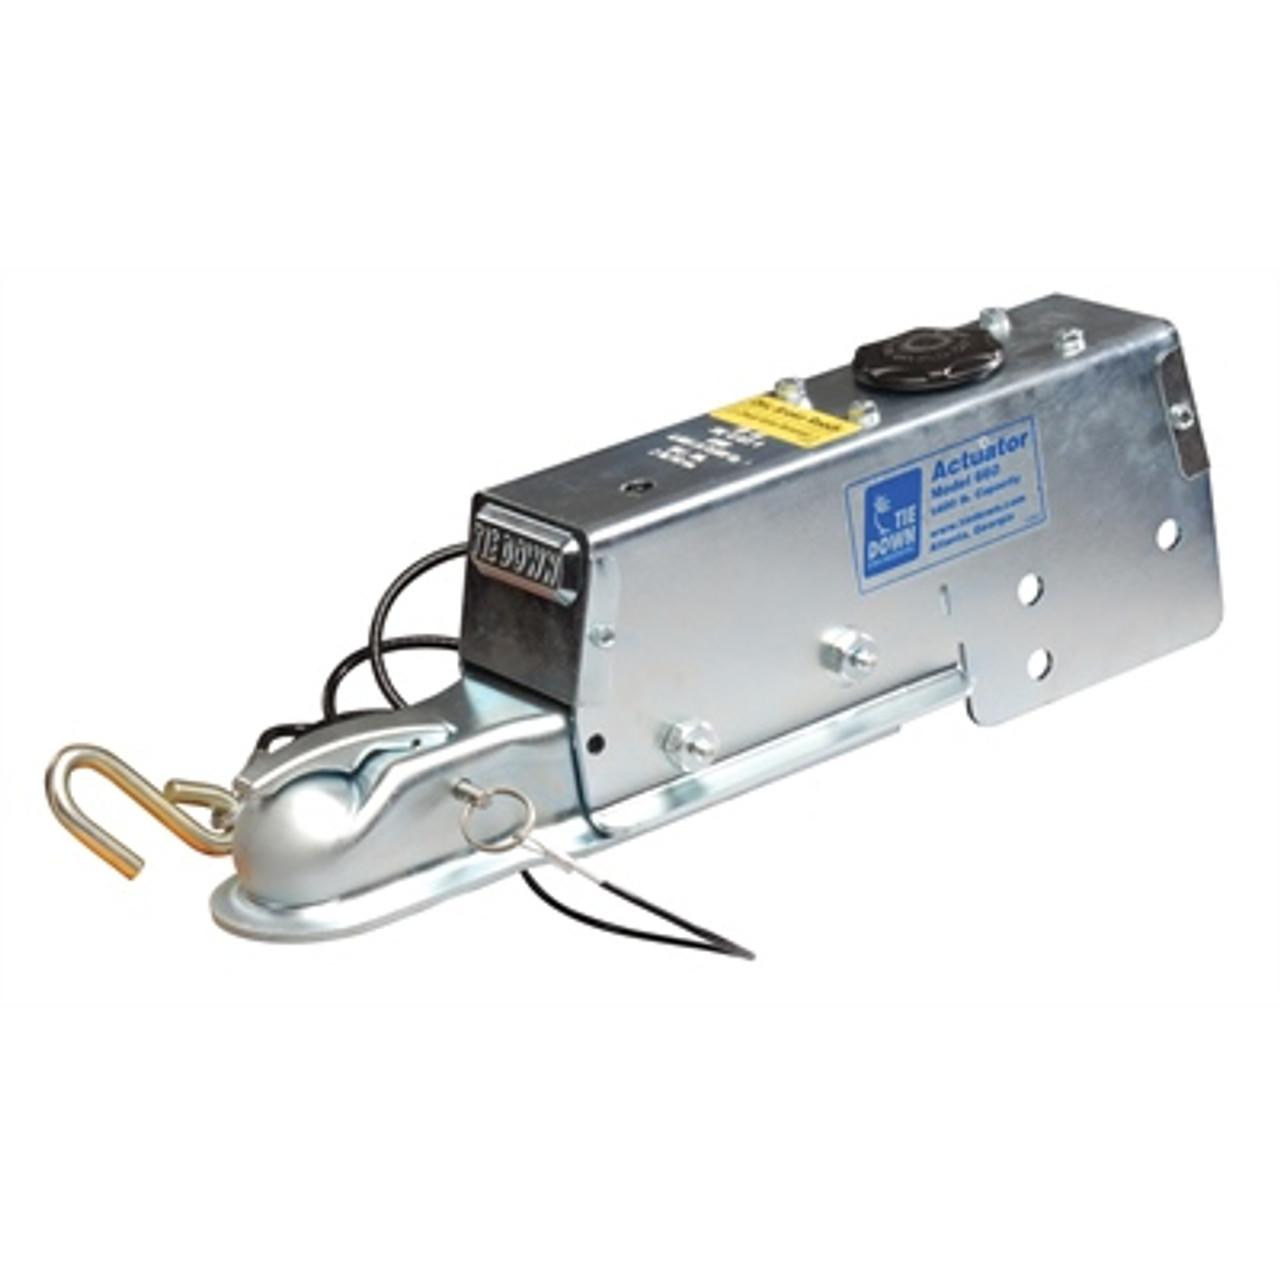 medium resolution of brake coupler tie down engineering model 660 actuator at champion trailers